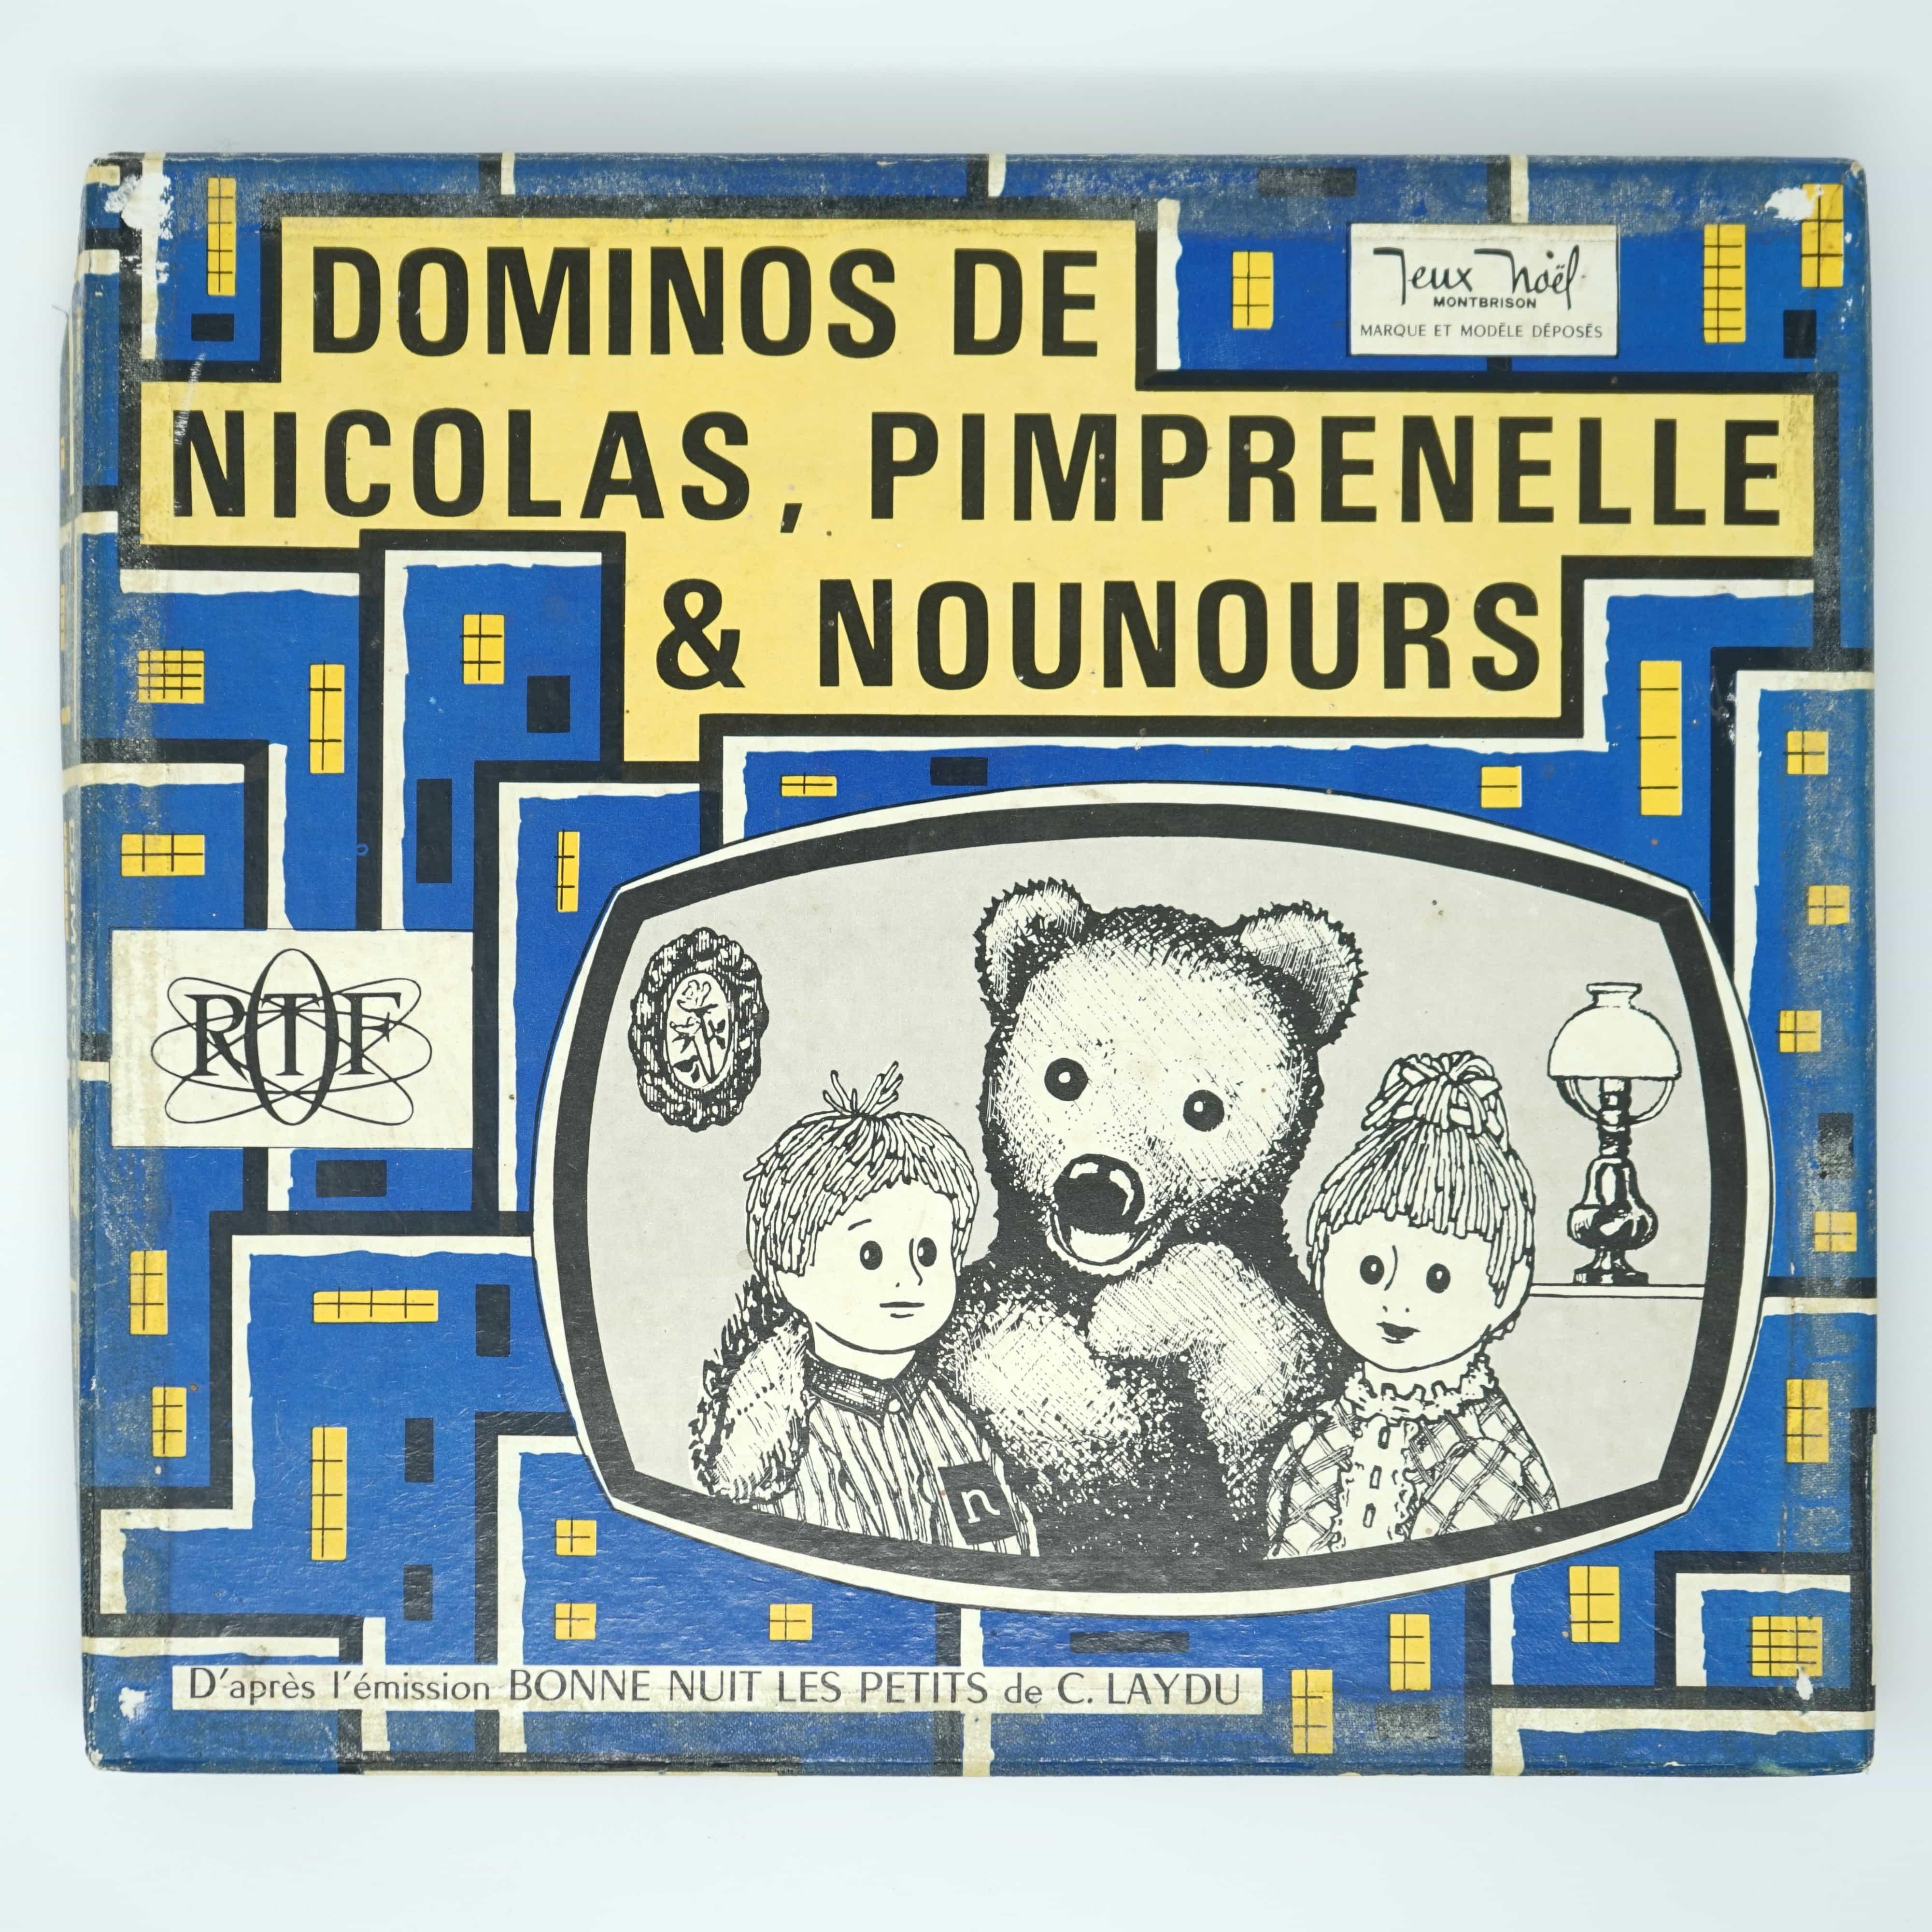 Dominos Nicolas Pimprenelle et Nounours